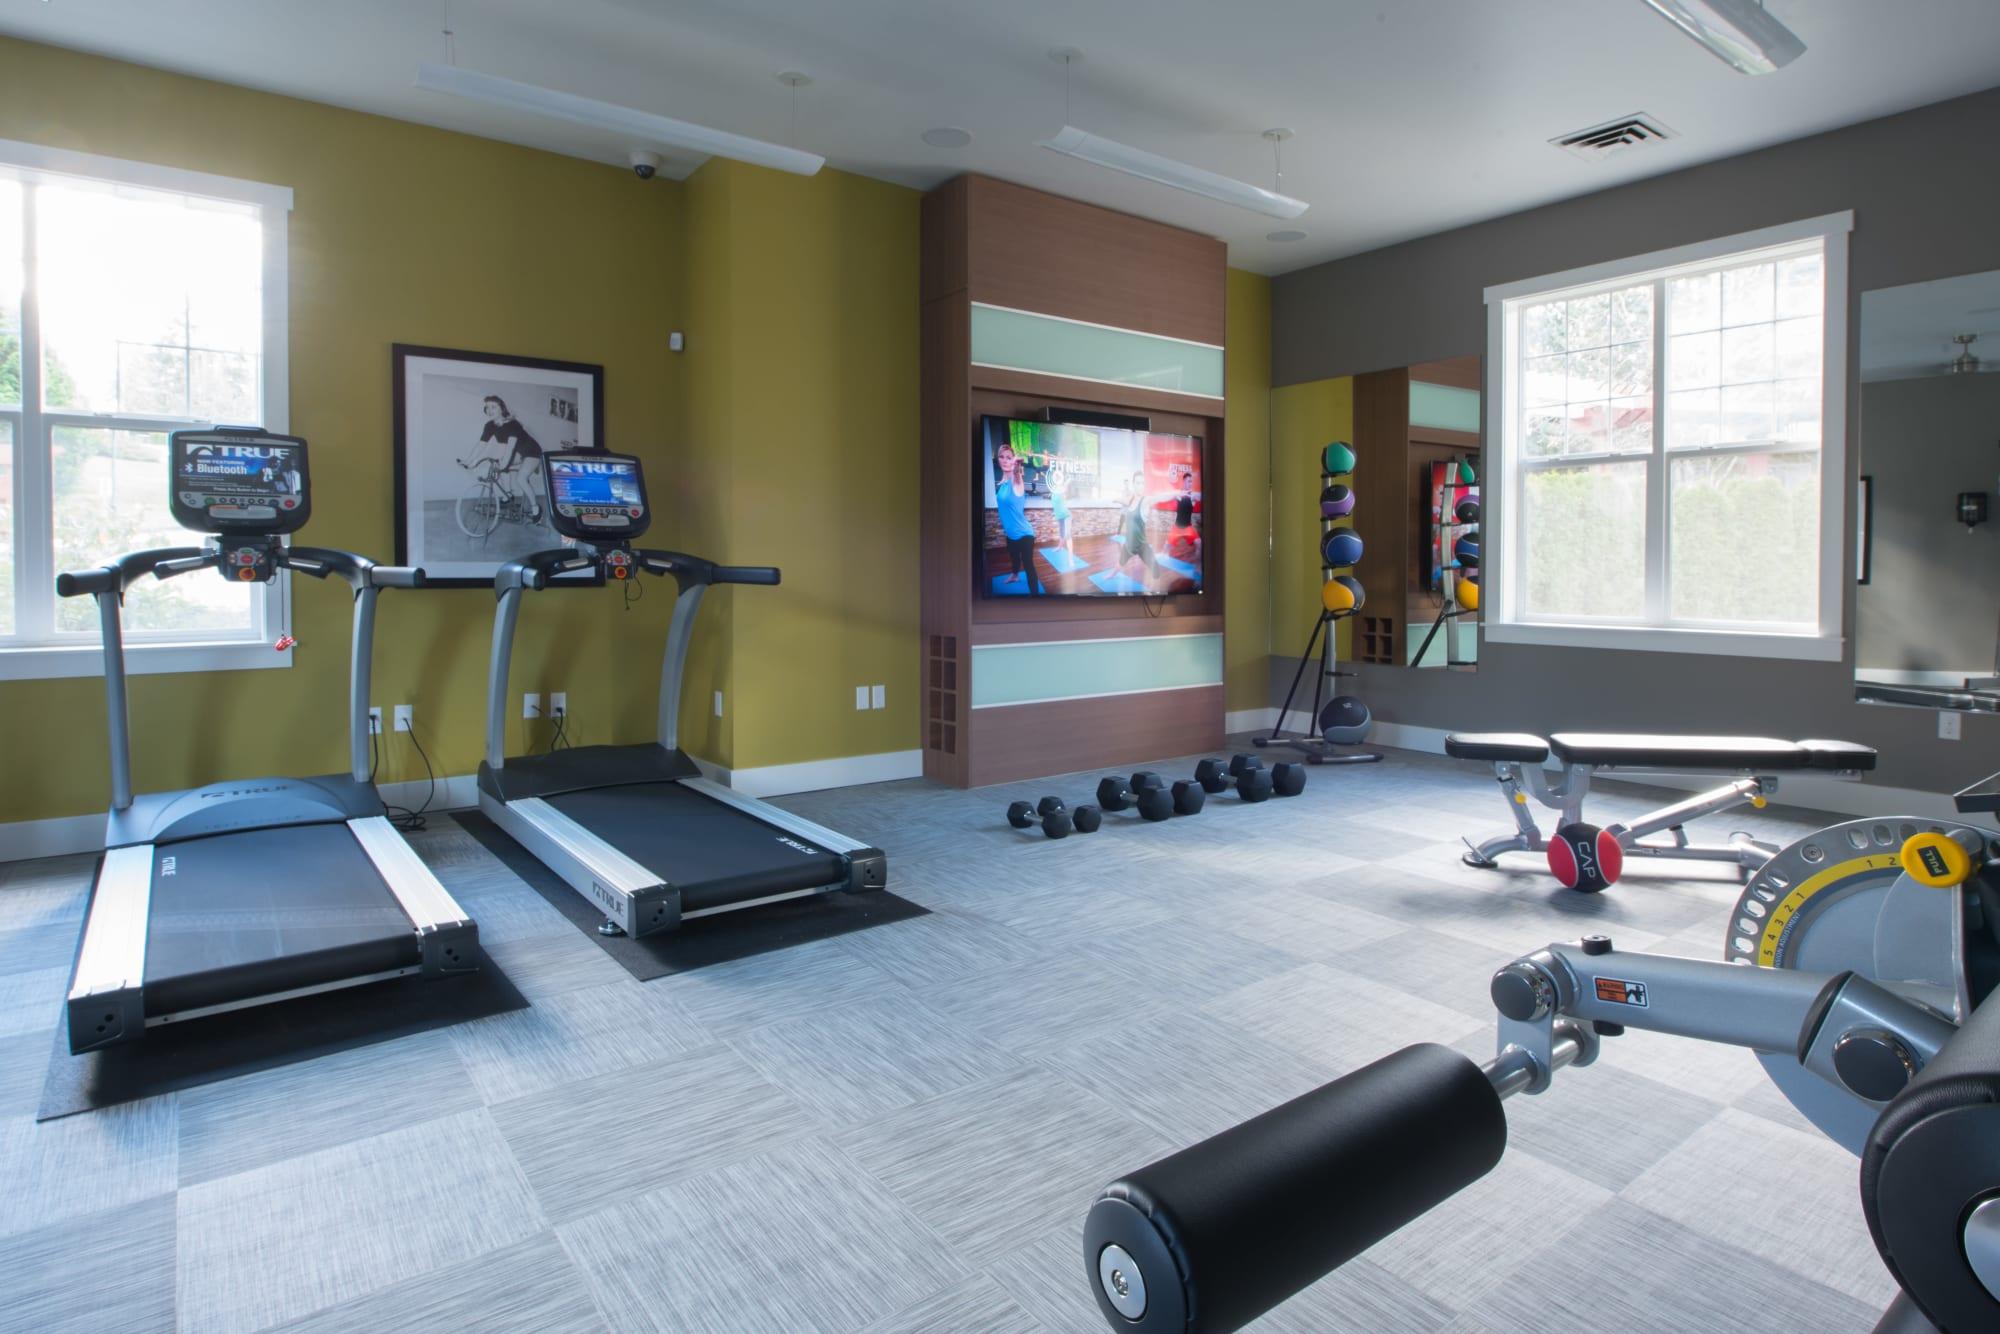 A fitness center with treadmills at Brookside Village in Auburn, Washington